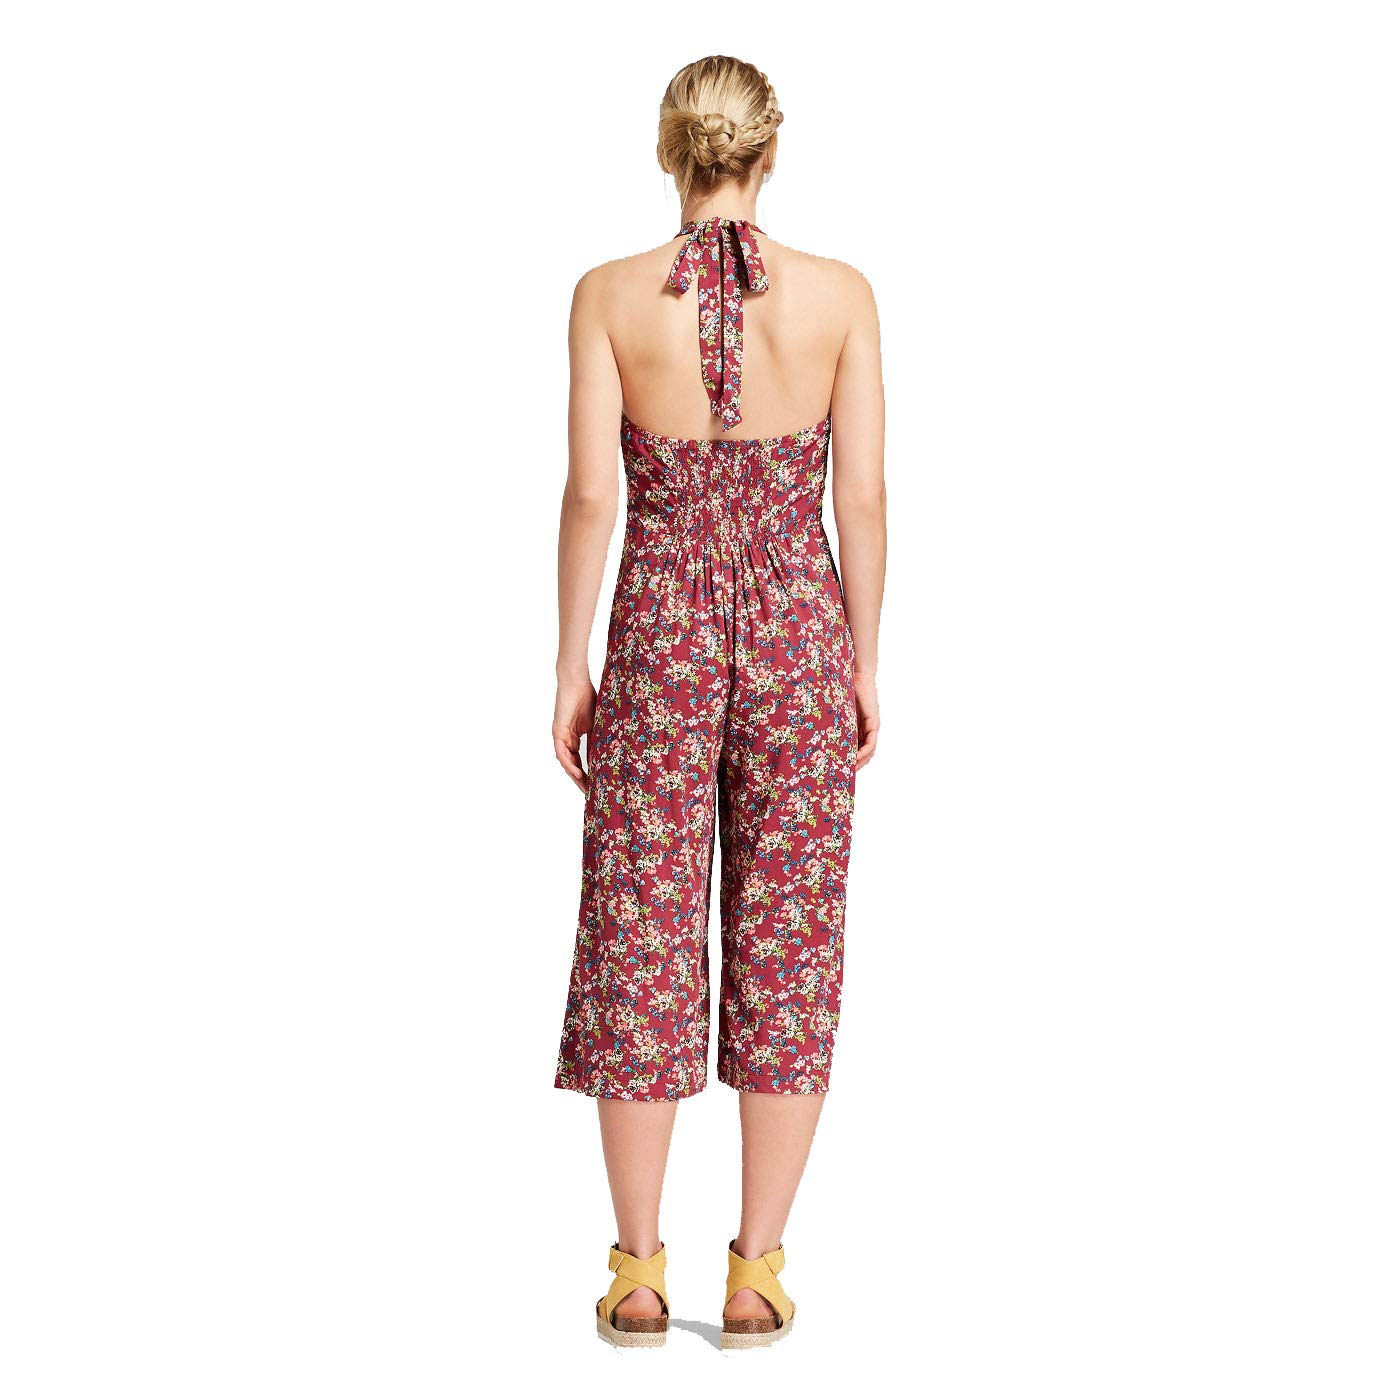 0533e0bfe480 Amazon.com  Xhilaration Women s Halter Top Overall Jumpsuit - Magenta -  XXLarge  Clothing